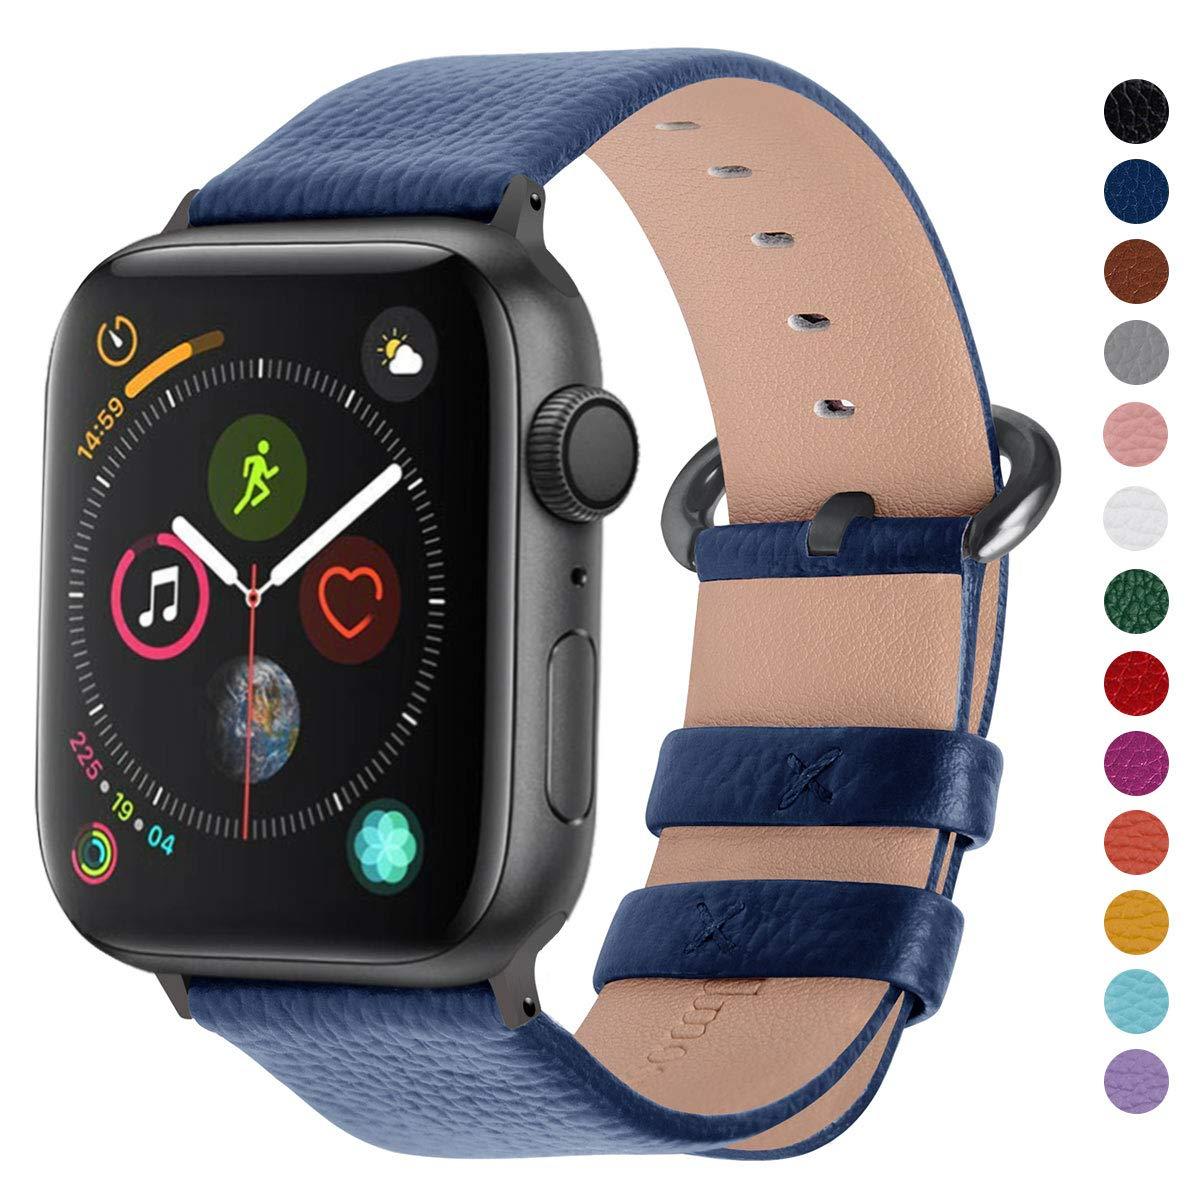 Malla Cuero para Apple Watch (38/40mm) FULLMOSA [7CLJL3P8]